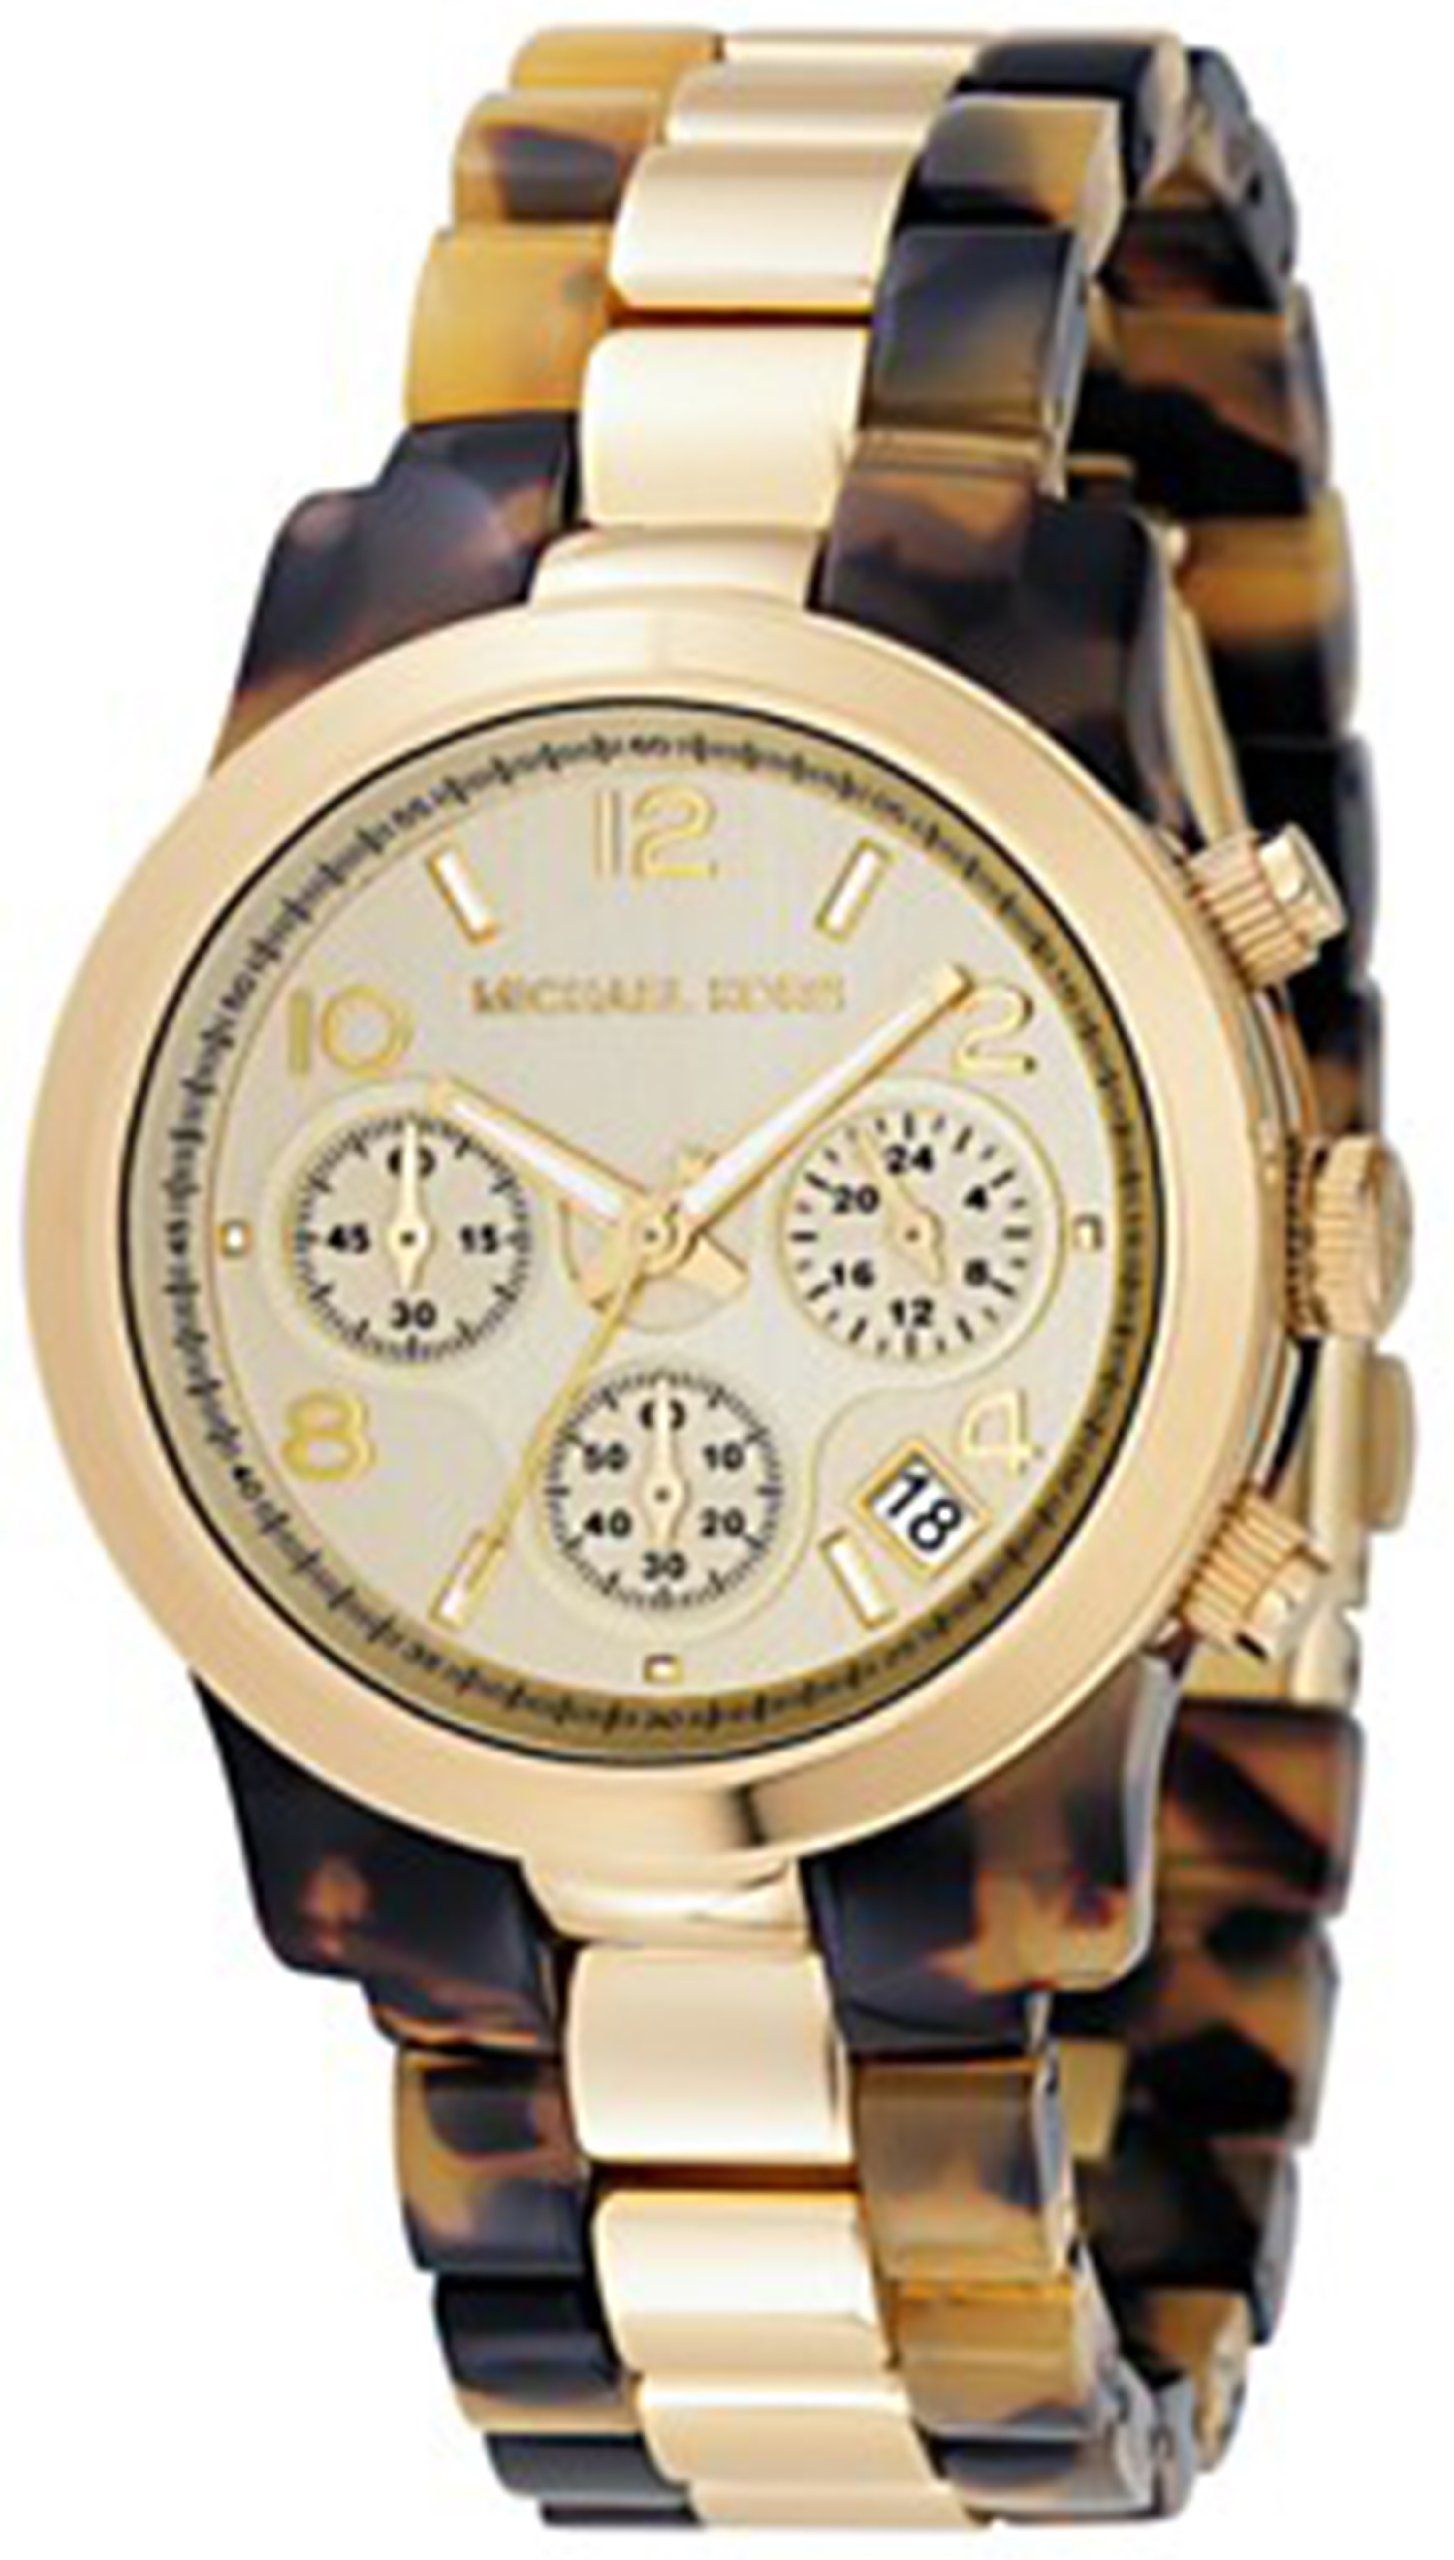 Michael Kors Mk5138 Reloj Cronografo De Cuarzo Para Mujer Correa De Plastico Multicolor Cronometro Amazon Es Reloj Reloj Michael Kors Michael Kors Reloj